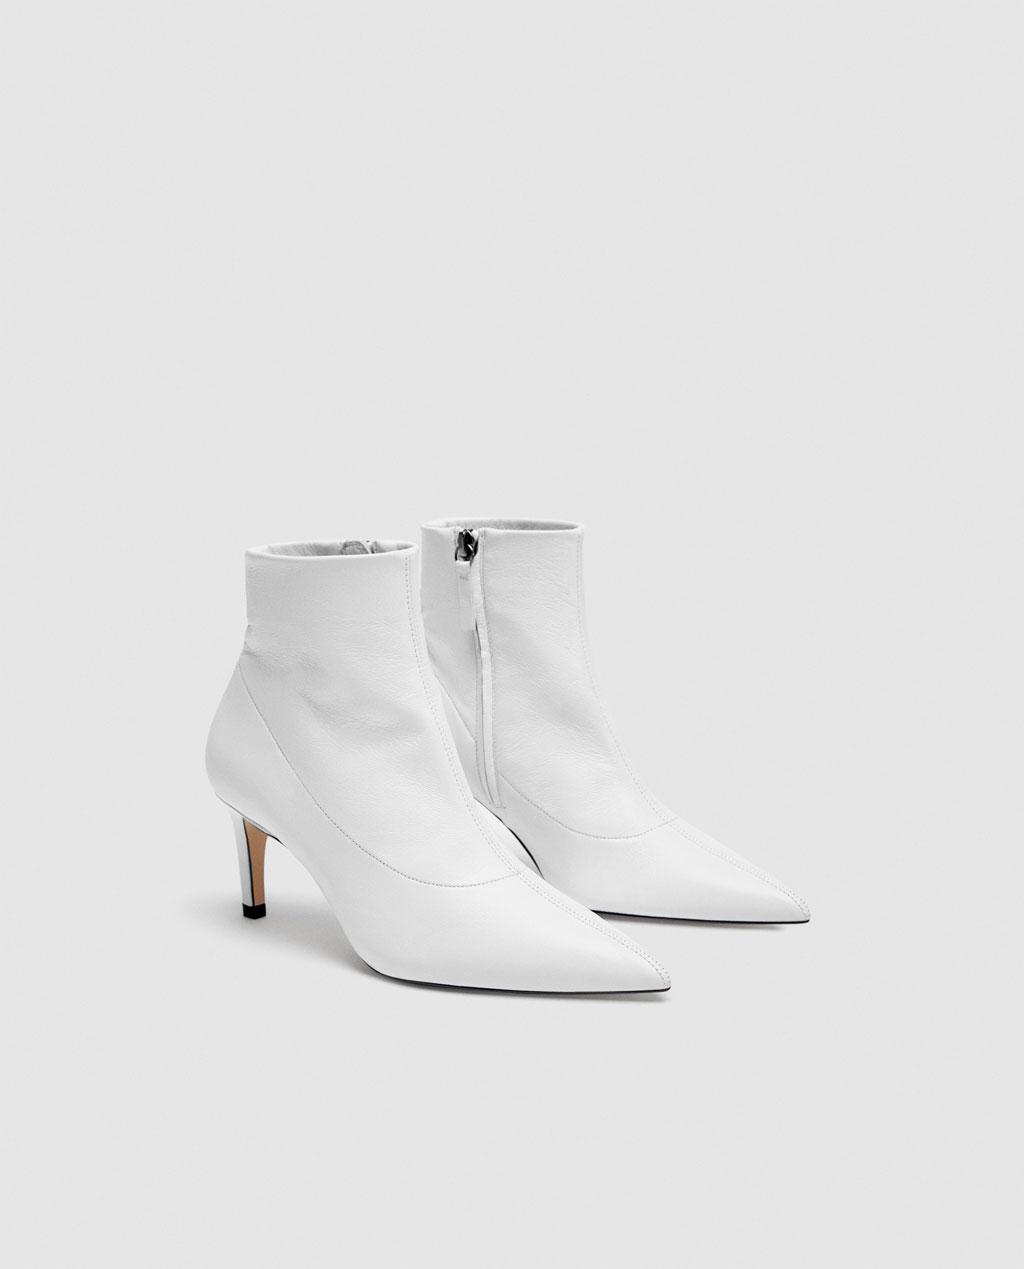 Zara-whiteboots